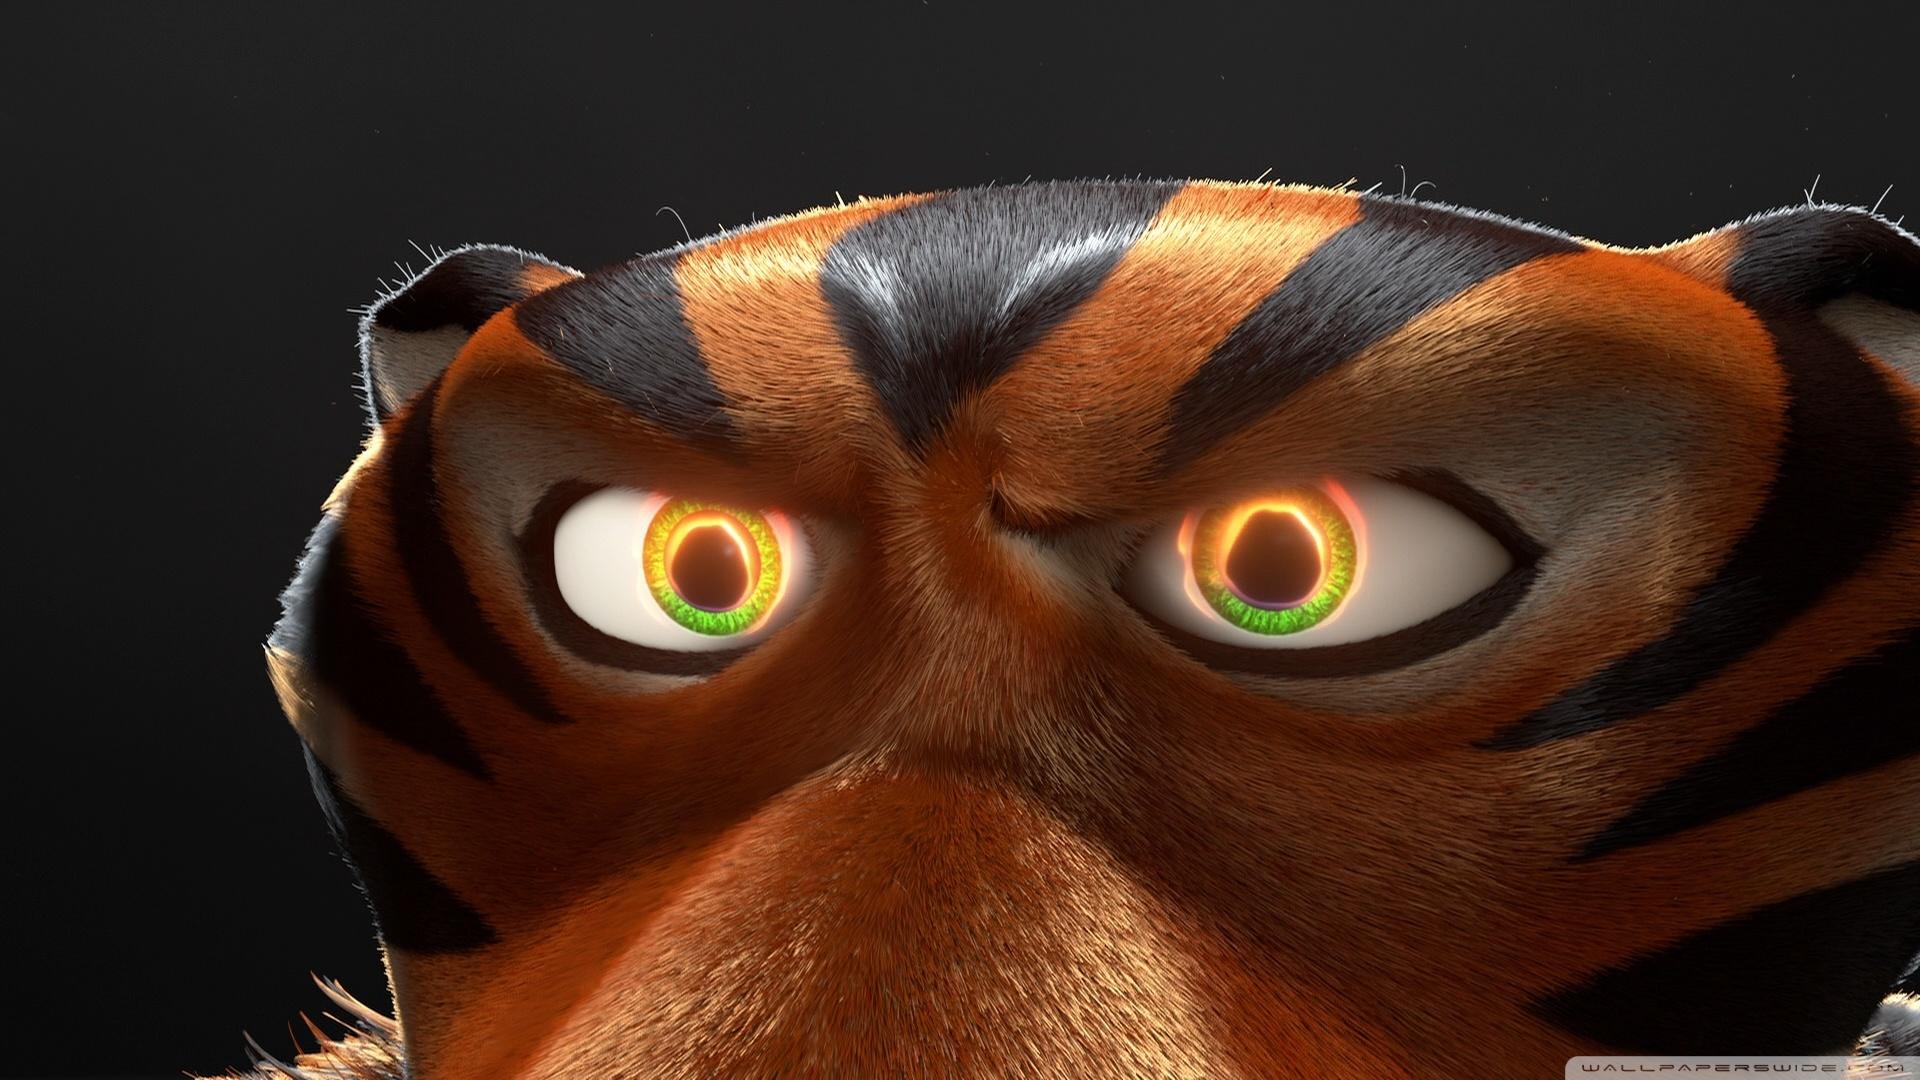 S Name Wallpaper Hd Download Madagascar 3 Ring Of Fire 4k Hd Desktop Wallpaper For 4k